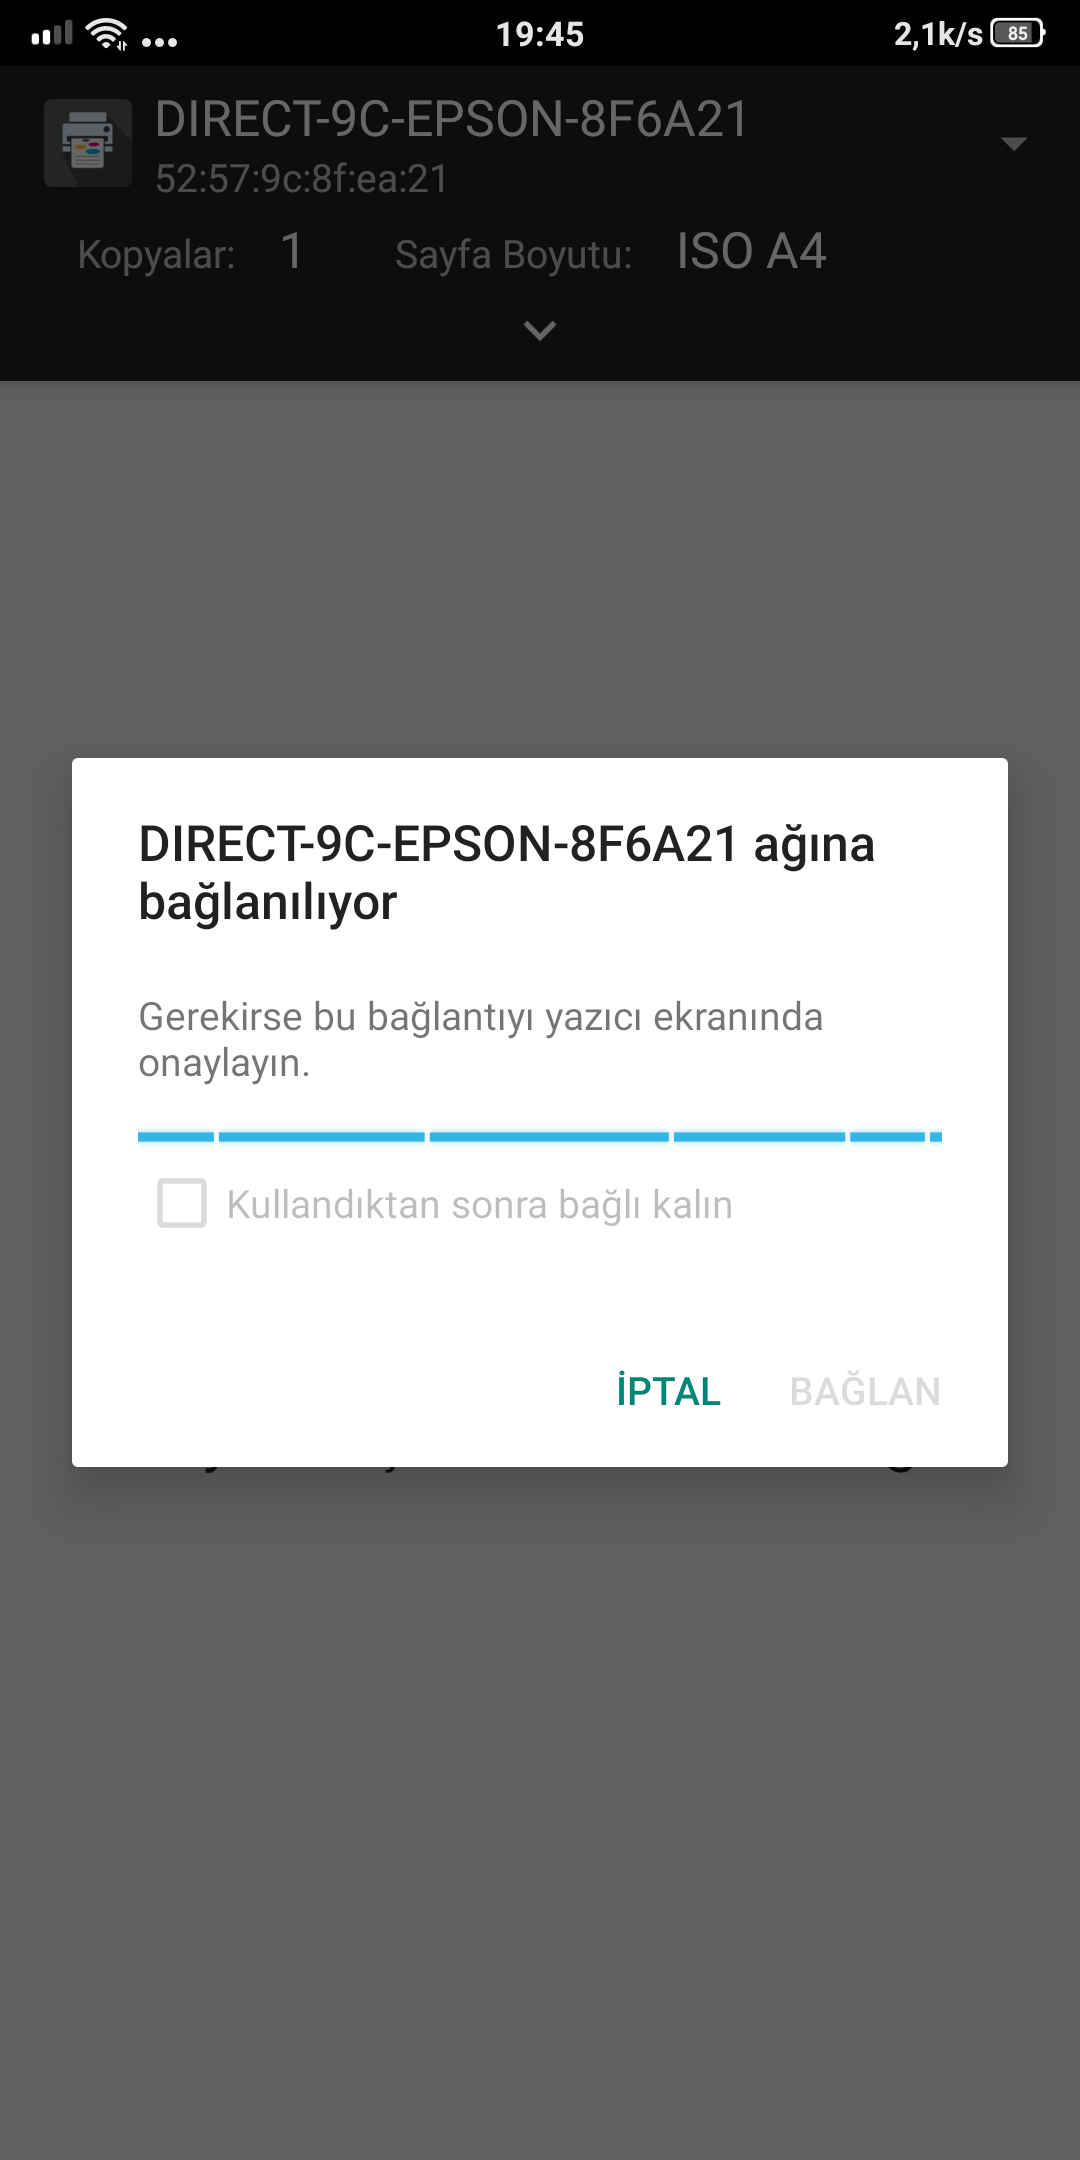 screenshot_2019-10-09-19-45-03-767_com.android.printspooler